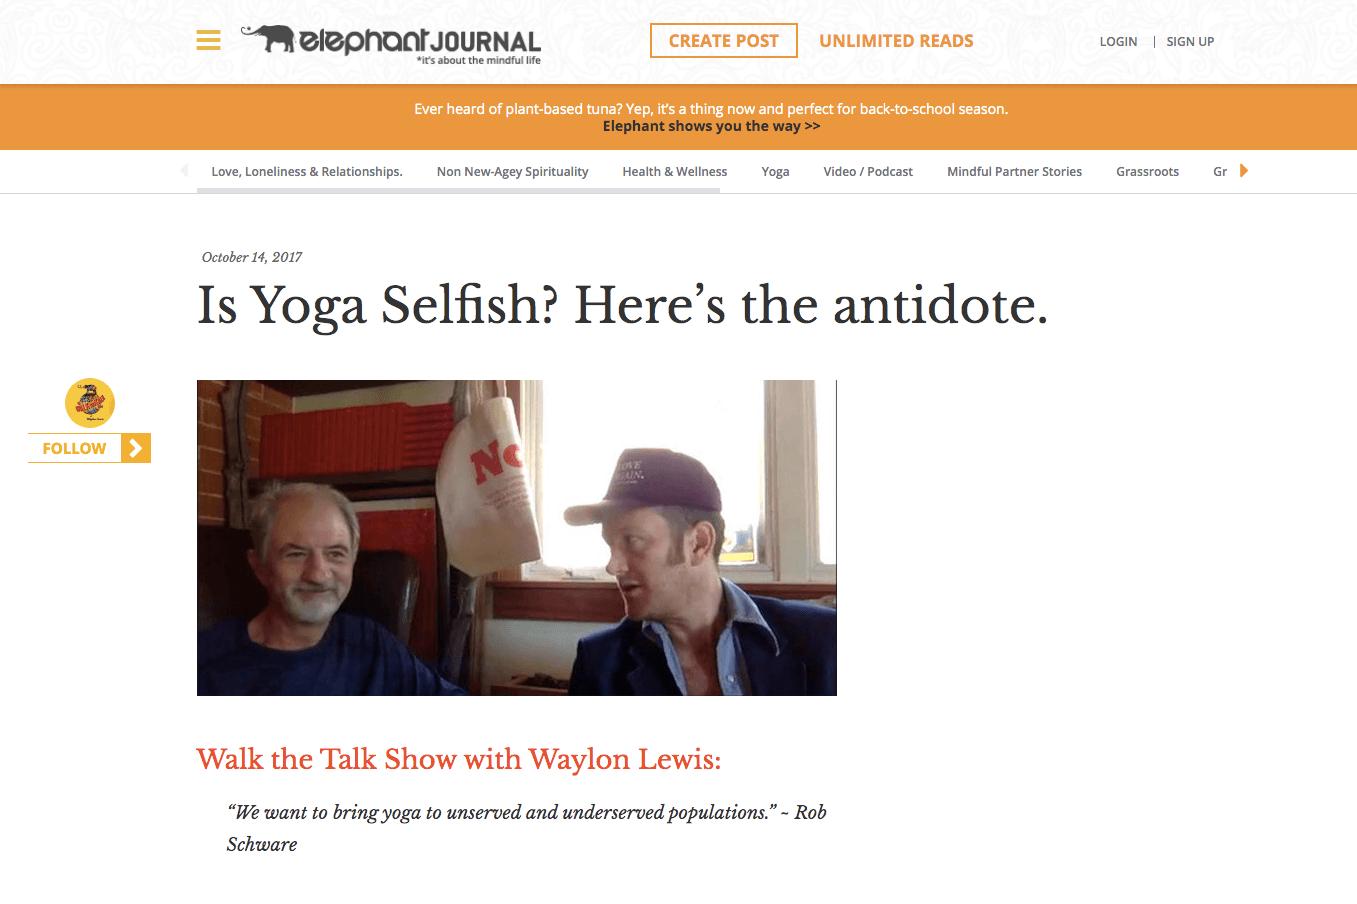 Is Yoga Selfish? Here's the antidote. | Elephant Journal